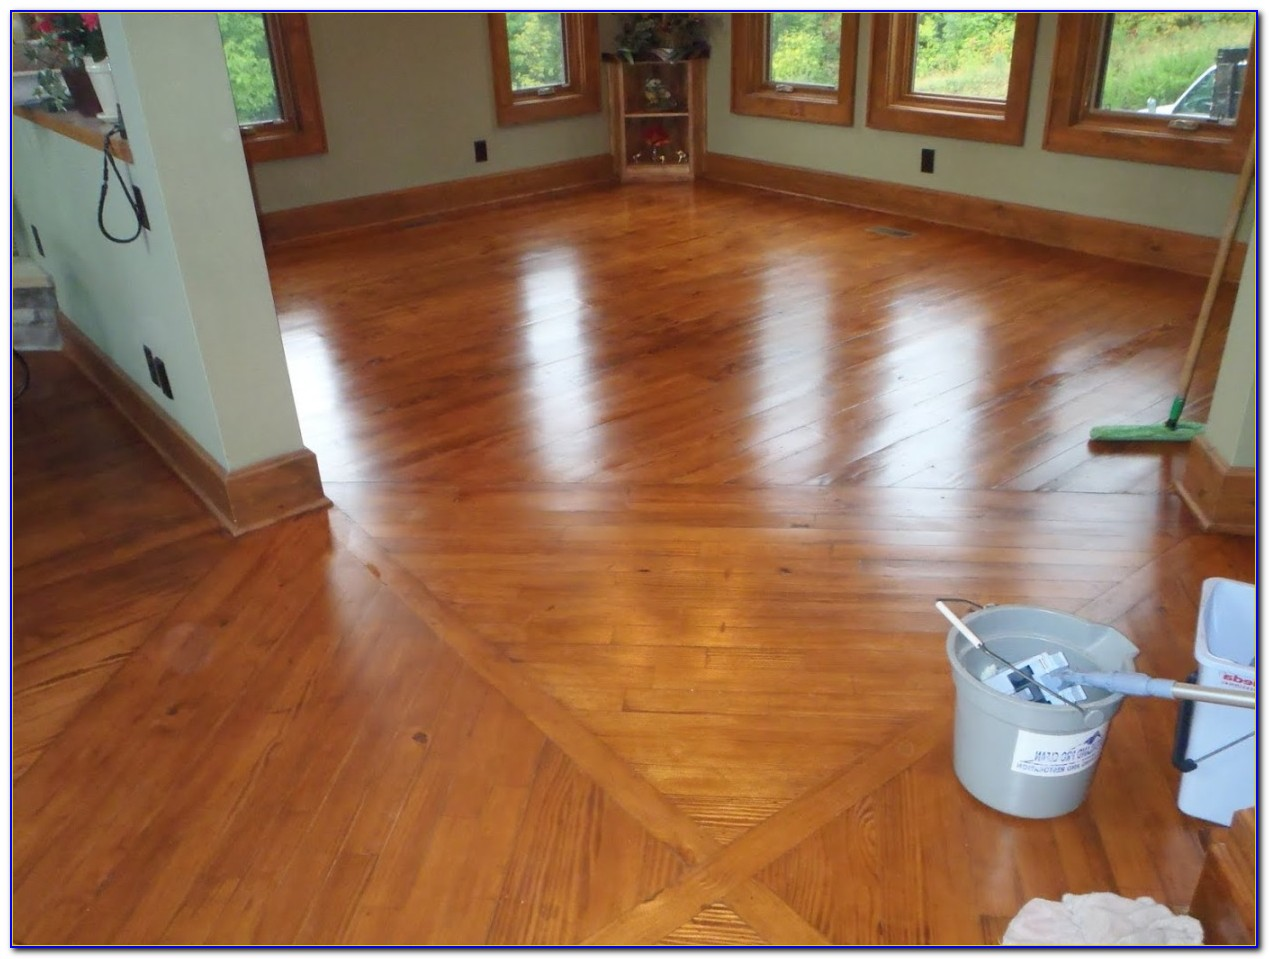 Best Cleaner To Mop Tile Floors